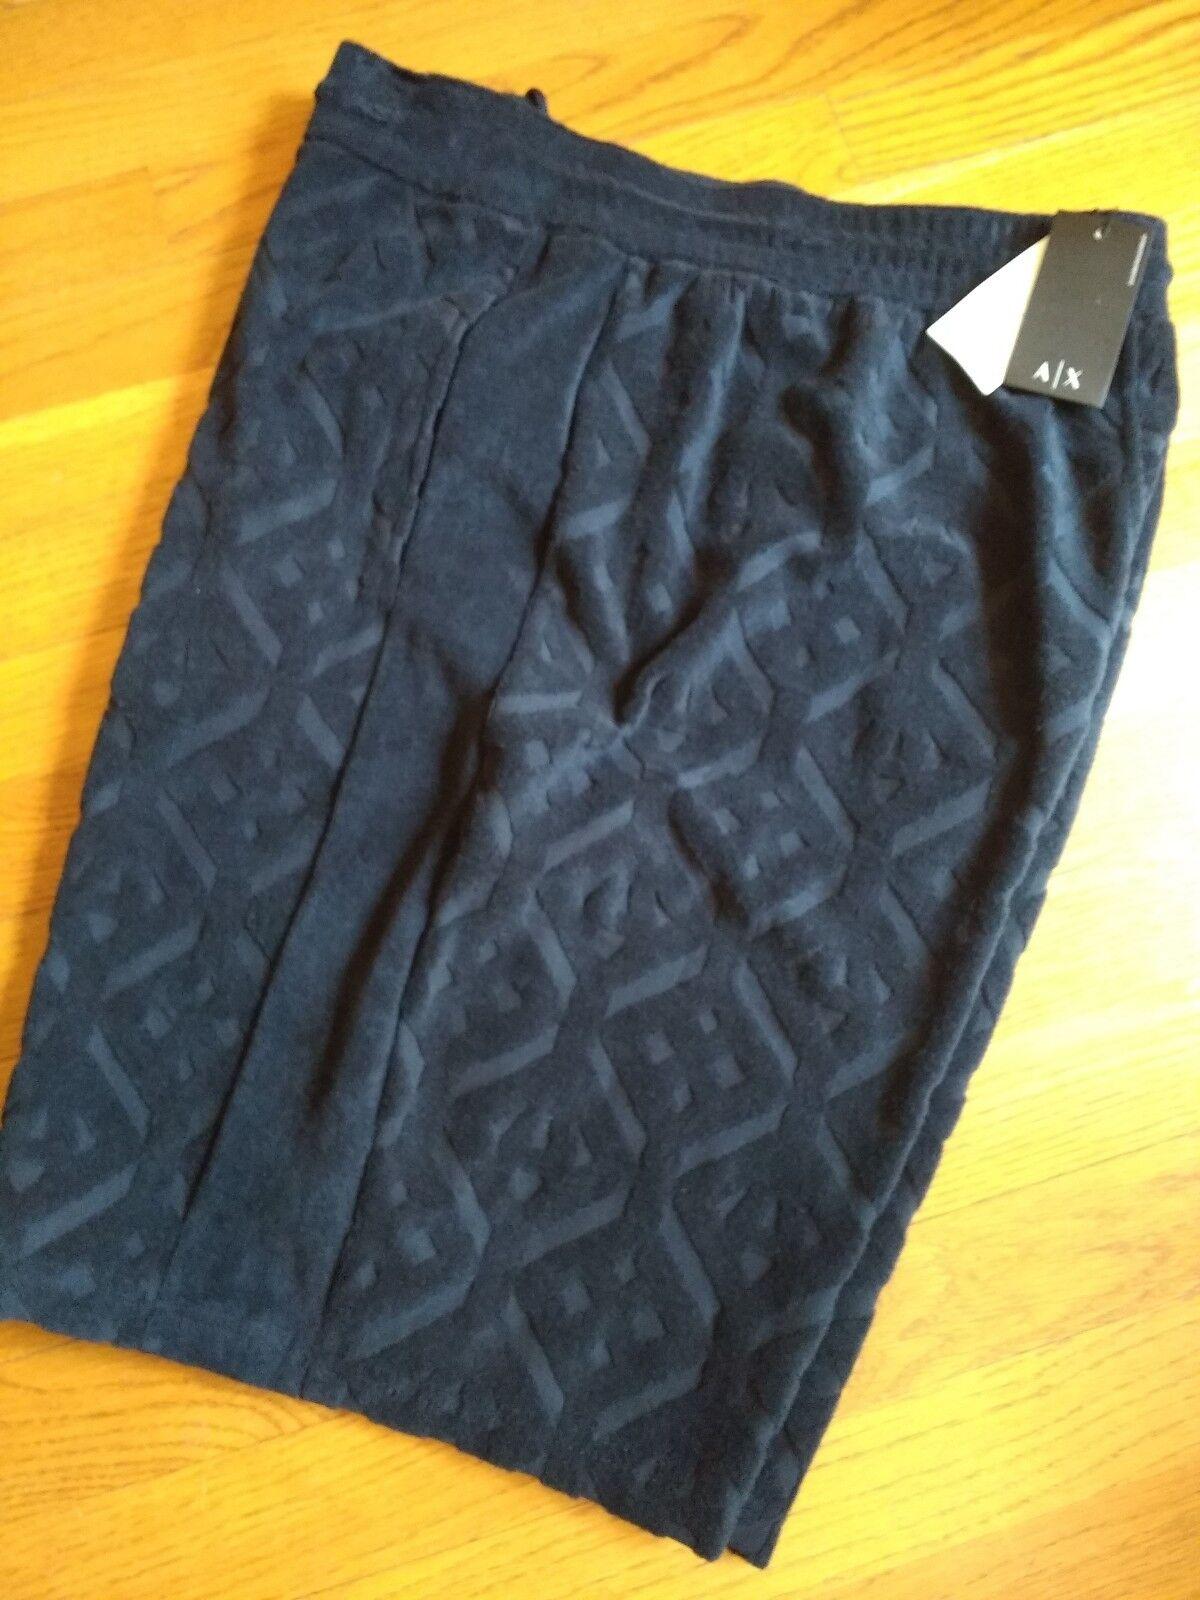 NWT,  MSRP, Mens Armani Cotton Blend Bermuda Elastic Pull On Lounge Shorts